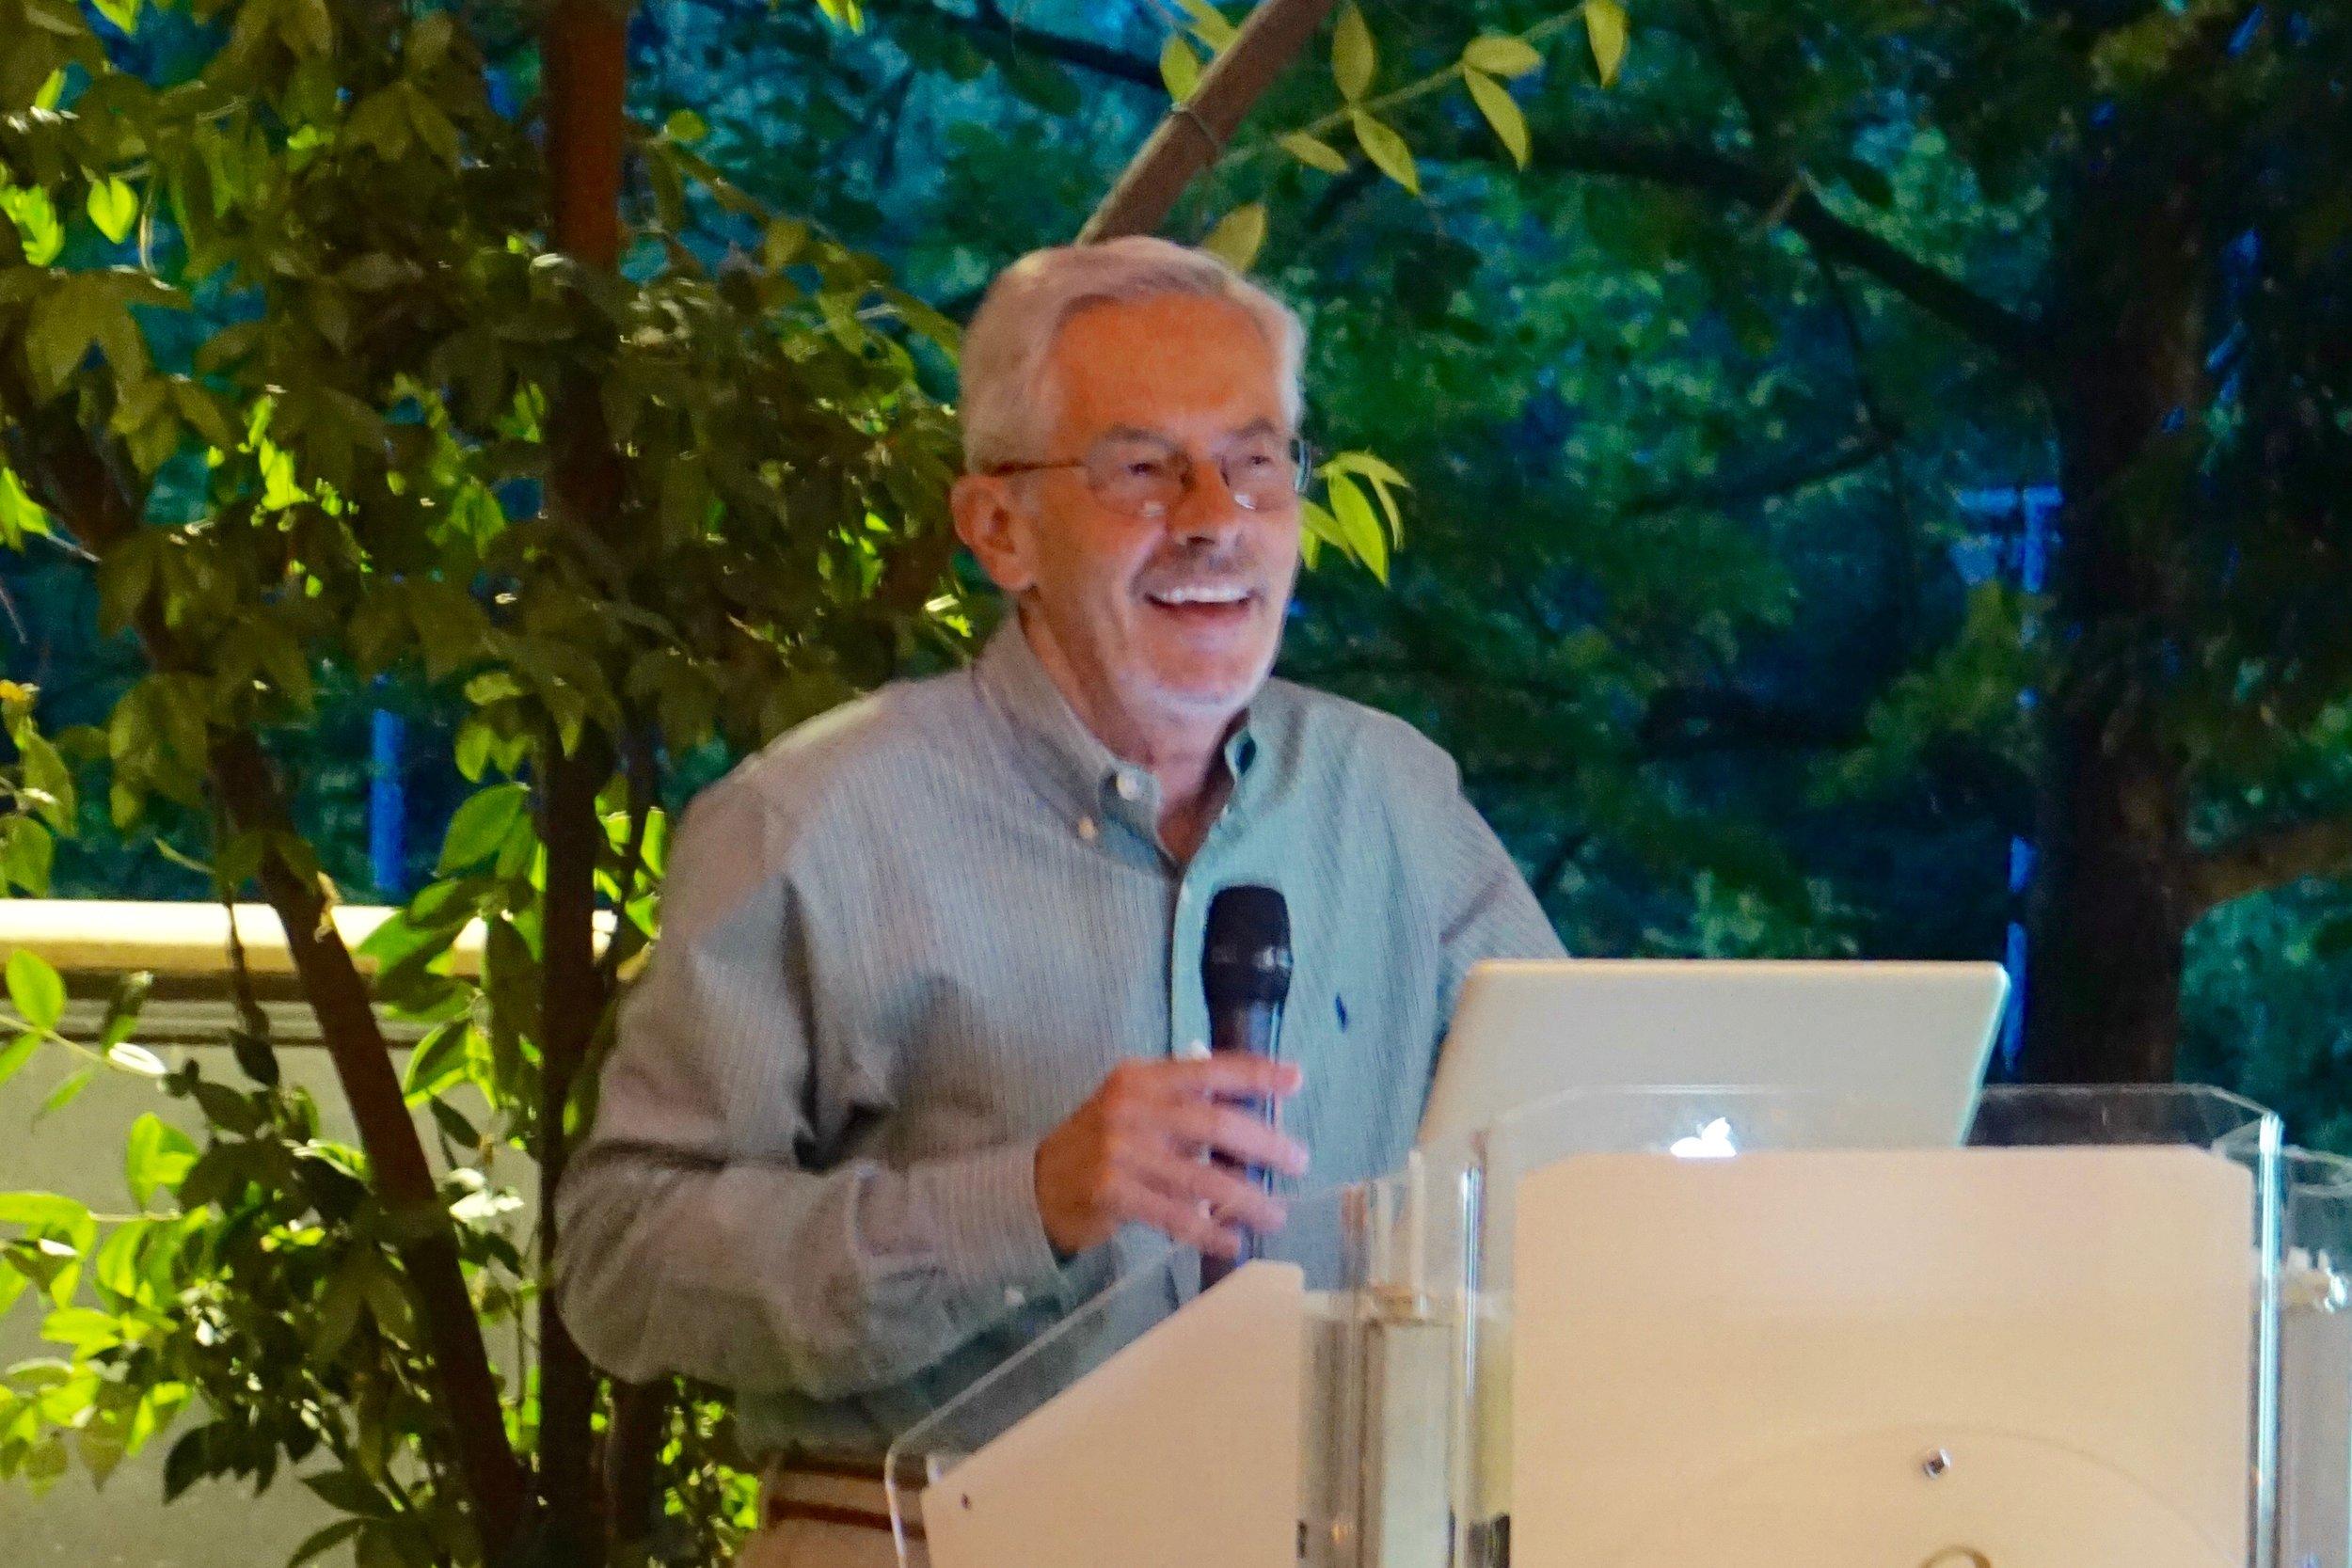 Dr. Reed E. Pyeritz,William Smilow Professor of Medicine and Professor of Genetics at the Perelman School of Medicine, University of Pennsylvania